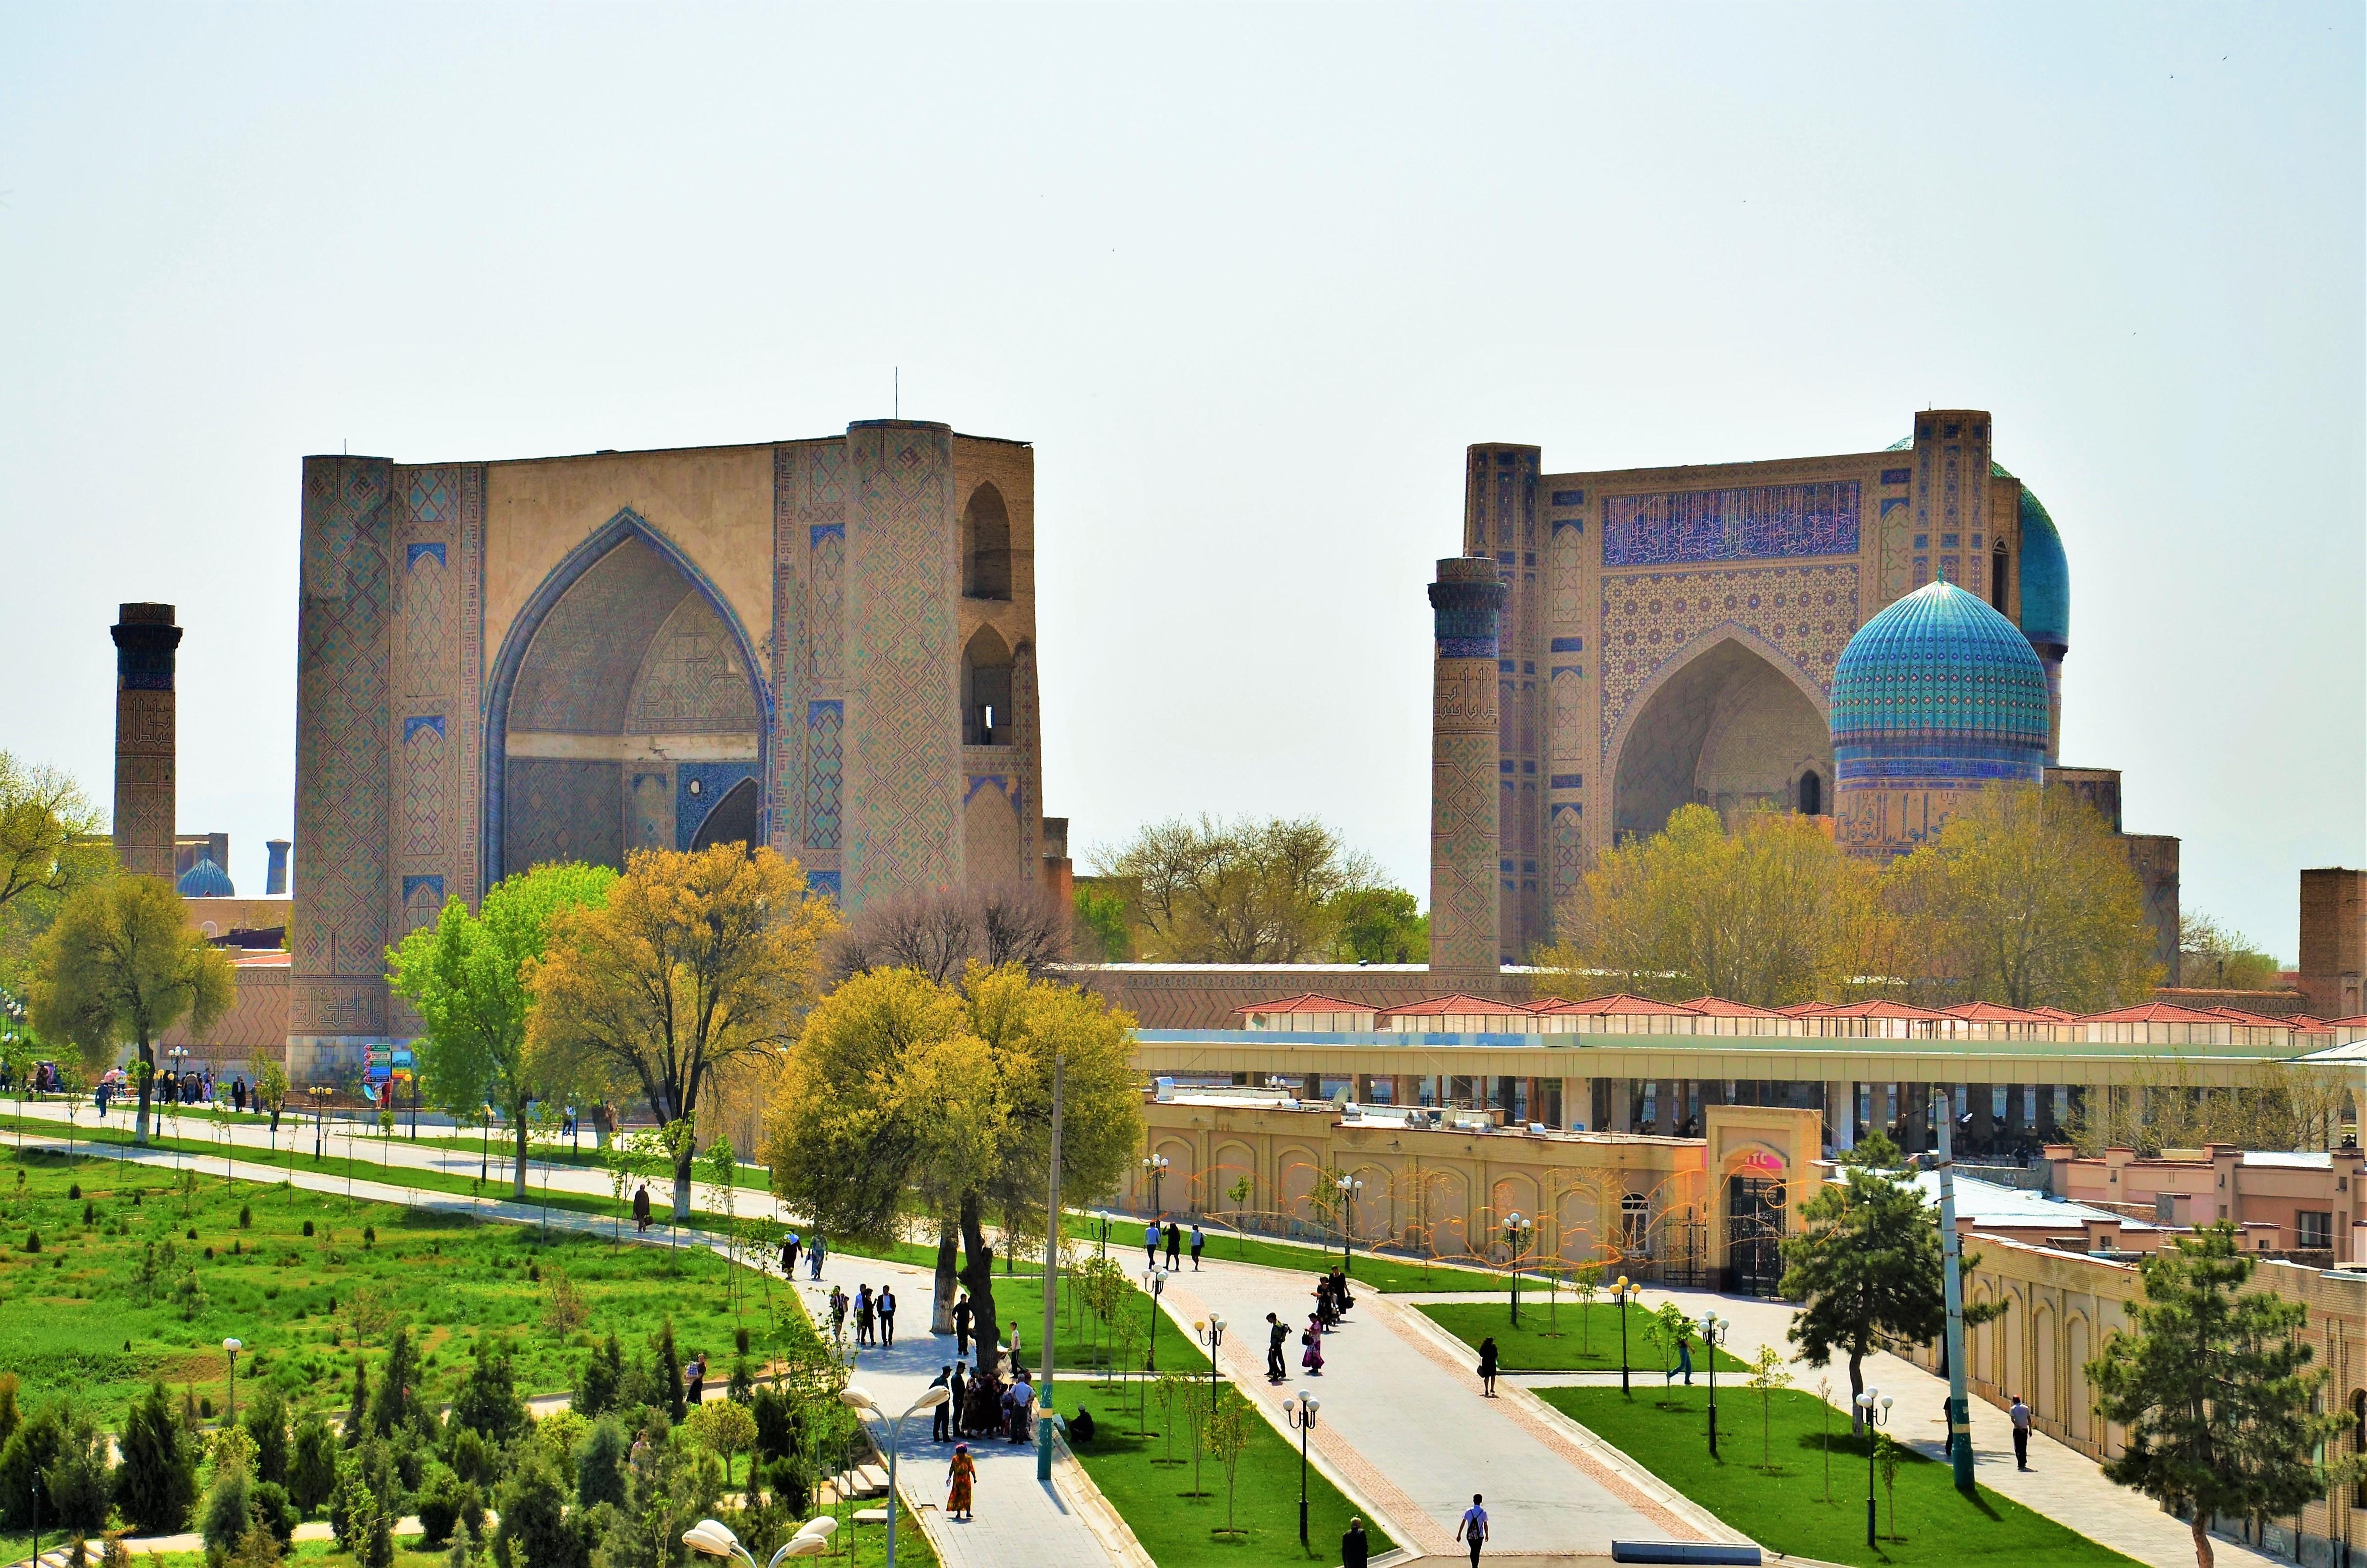 File:Mosque Bibi Khanum (5).JPG - Wikimedia Commons